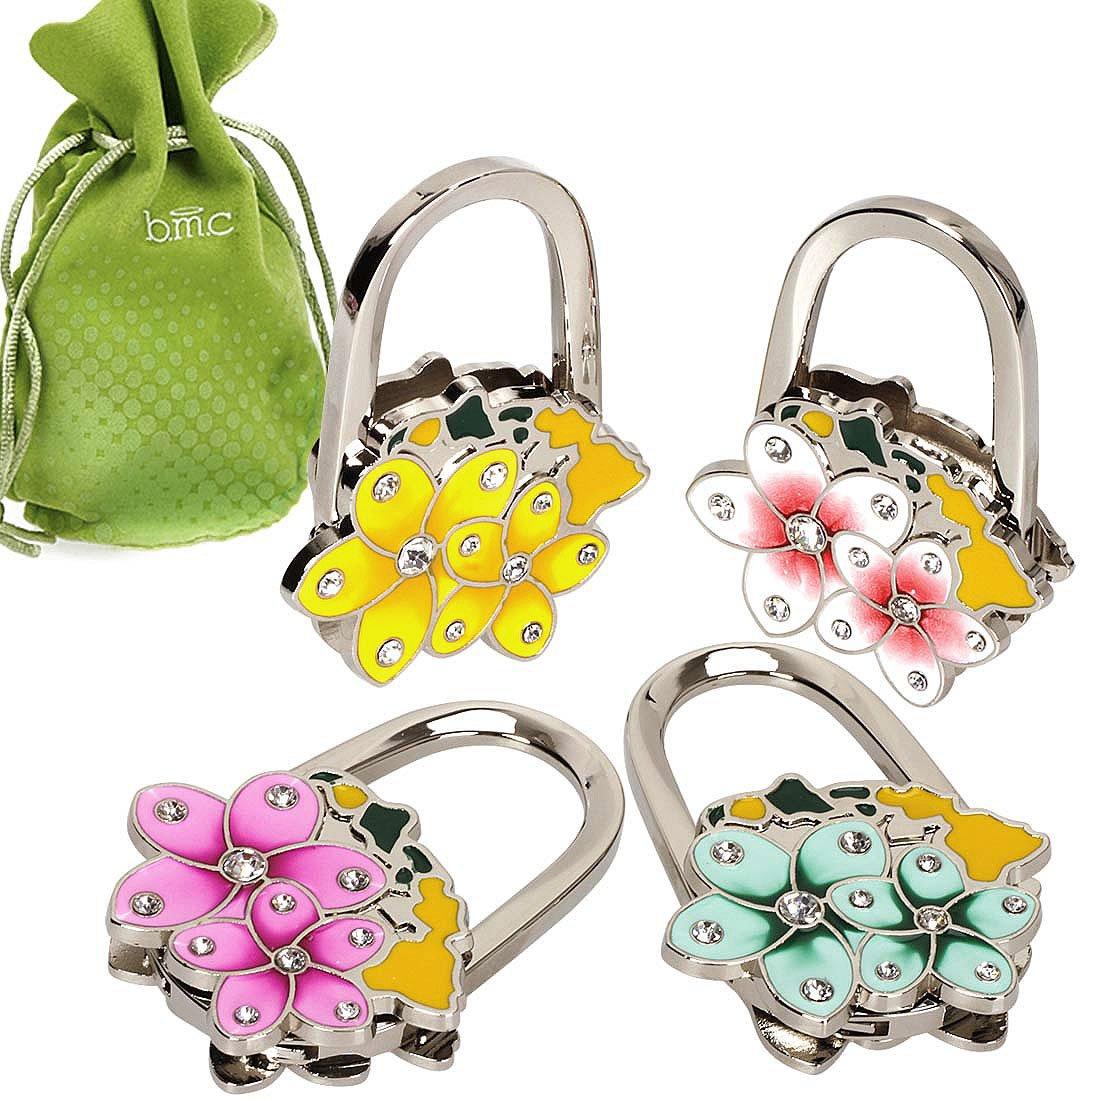 BMC 4pc Theme Designed Shoulder Handbag Folding Purse Holder Hangers Hooks Set - Hawaii Island Theme